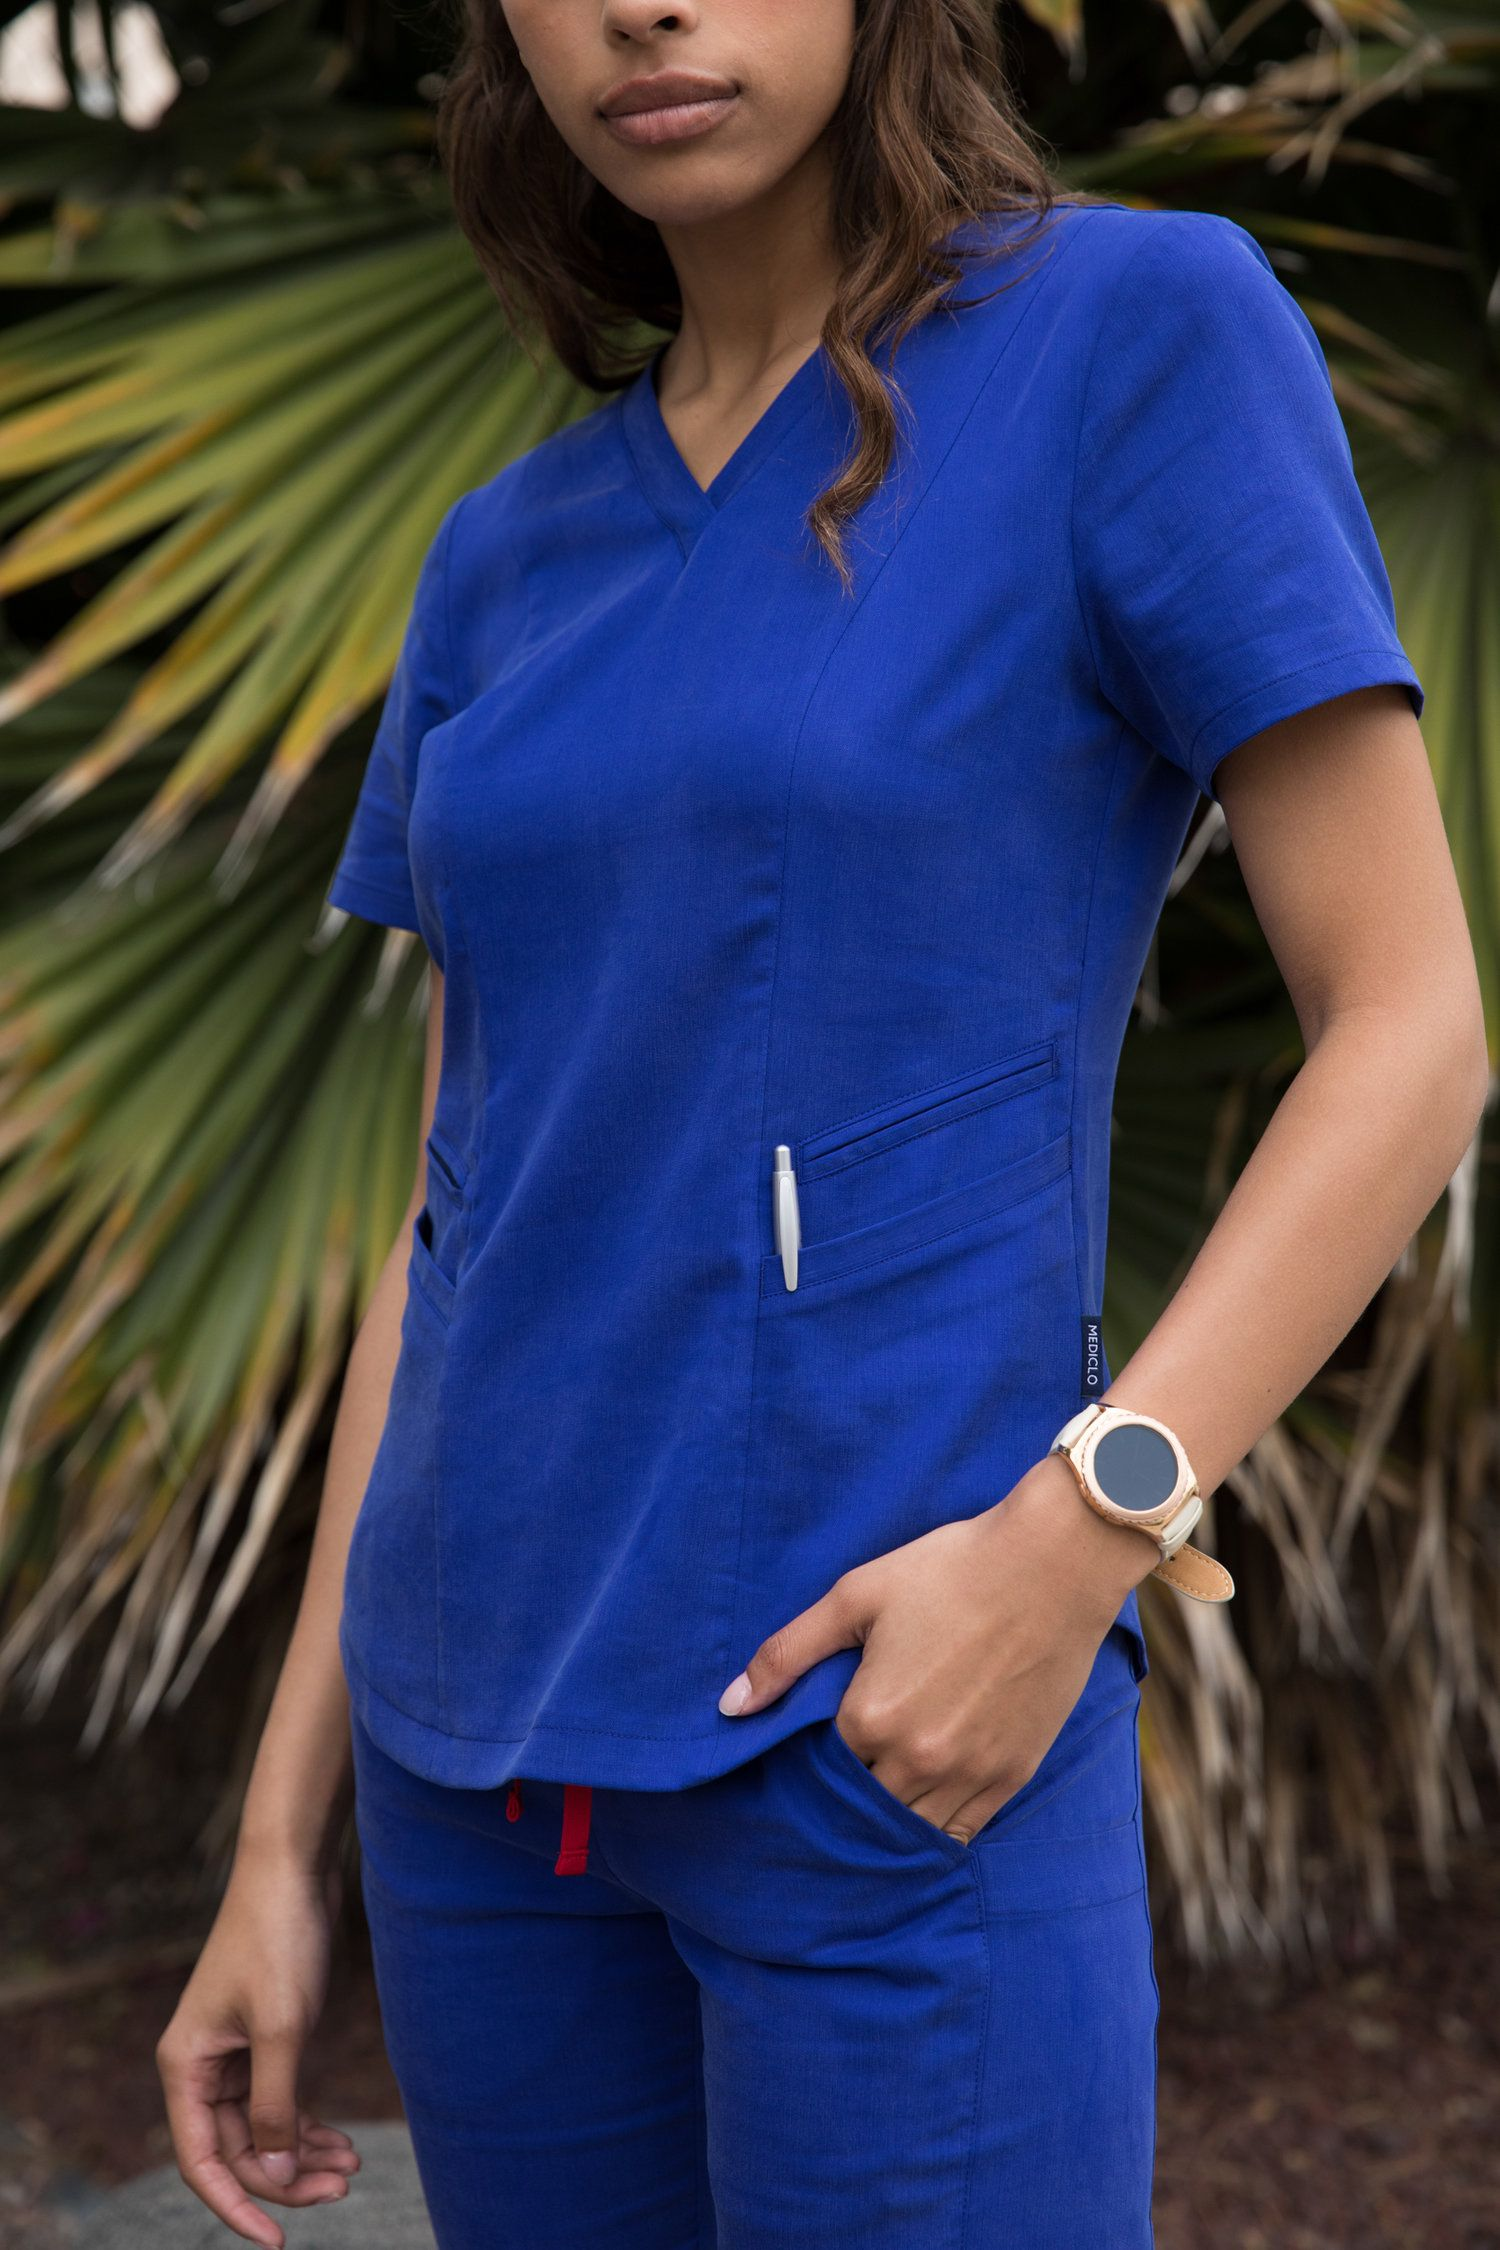 Royal Blue: be royal😆 | Medical scrubs, Scrubs, Fashion